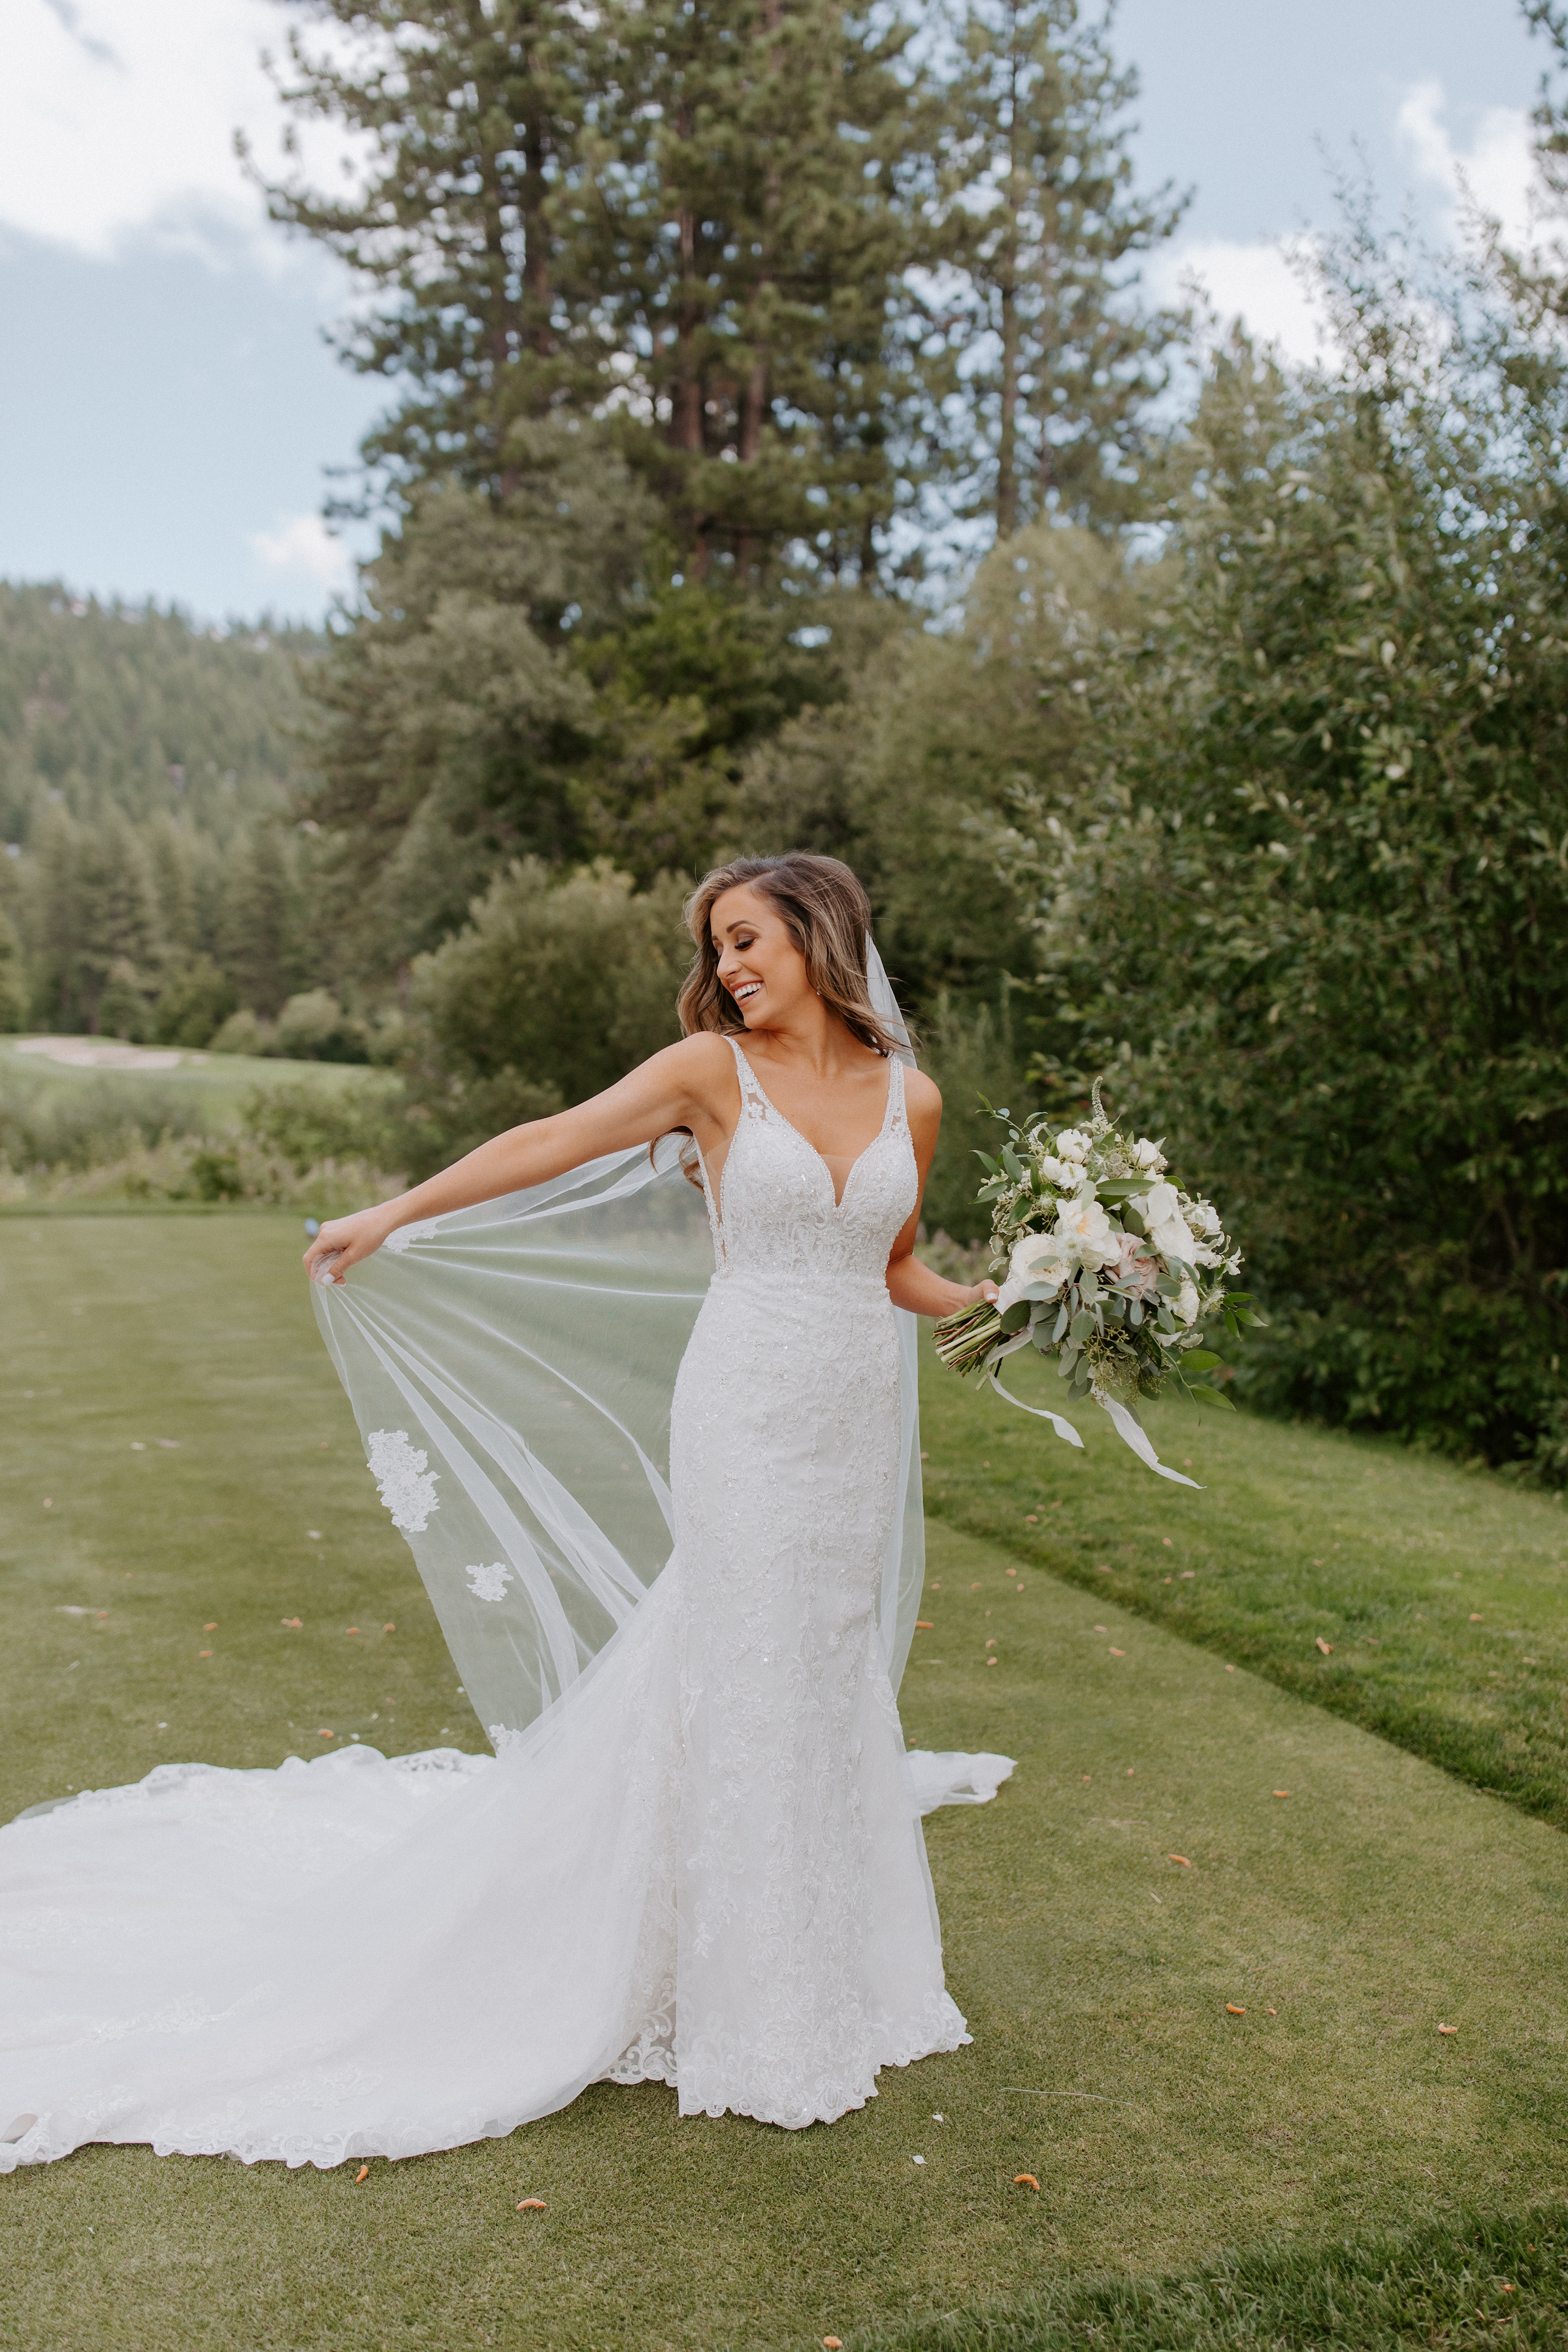 Neutral Toned Timeless Lake Tahoe Wedding Kay Kroshus27